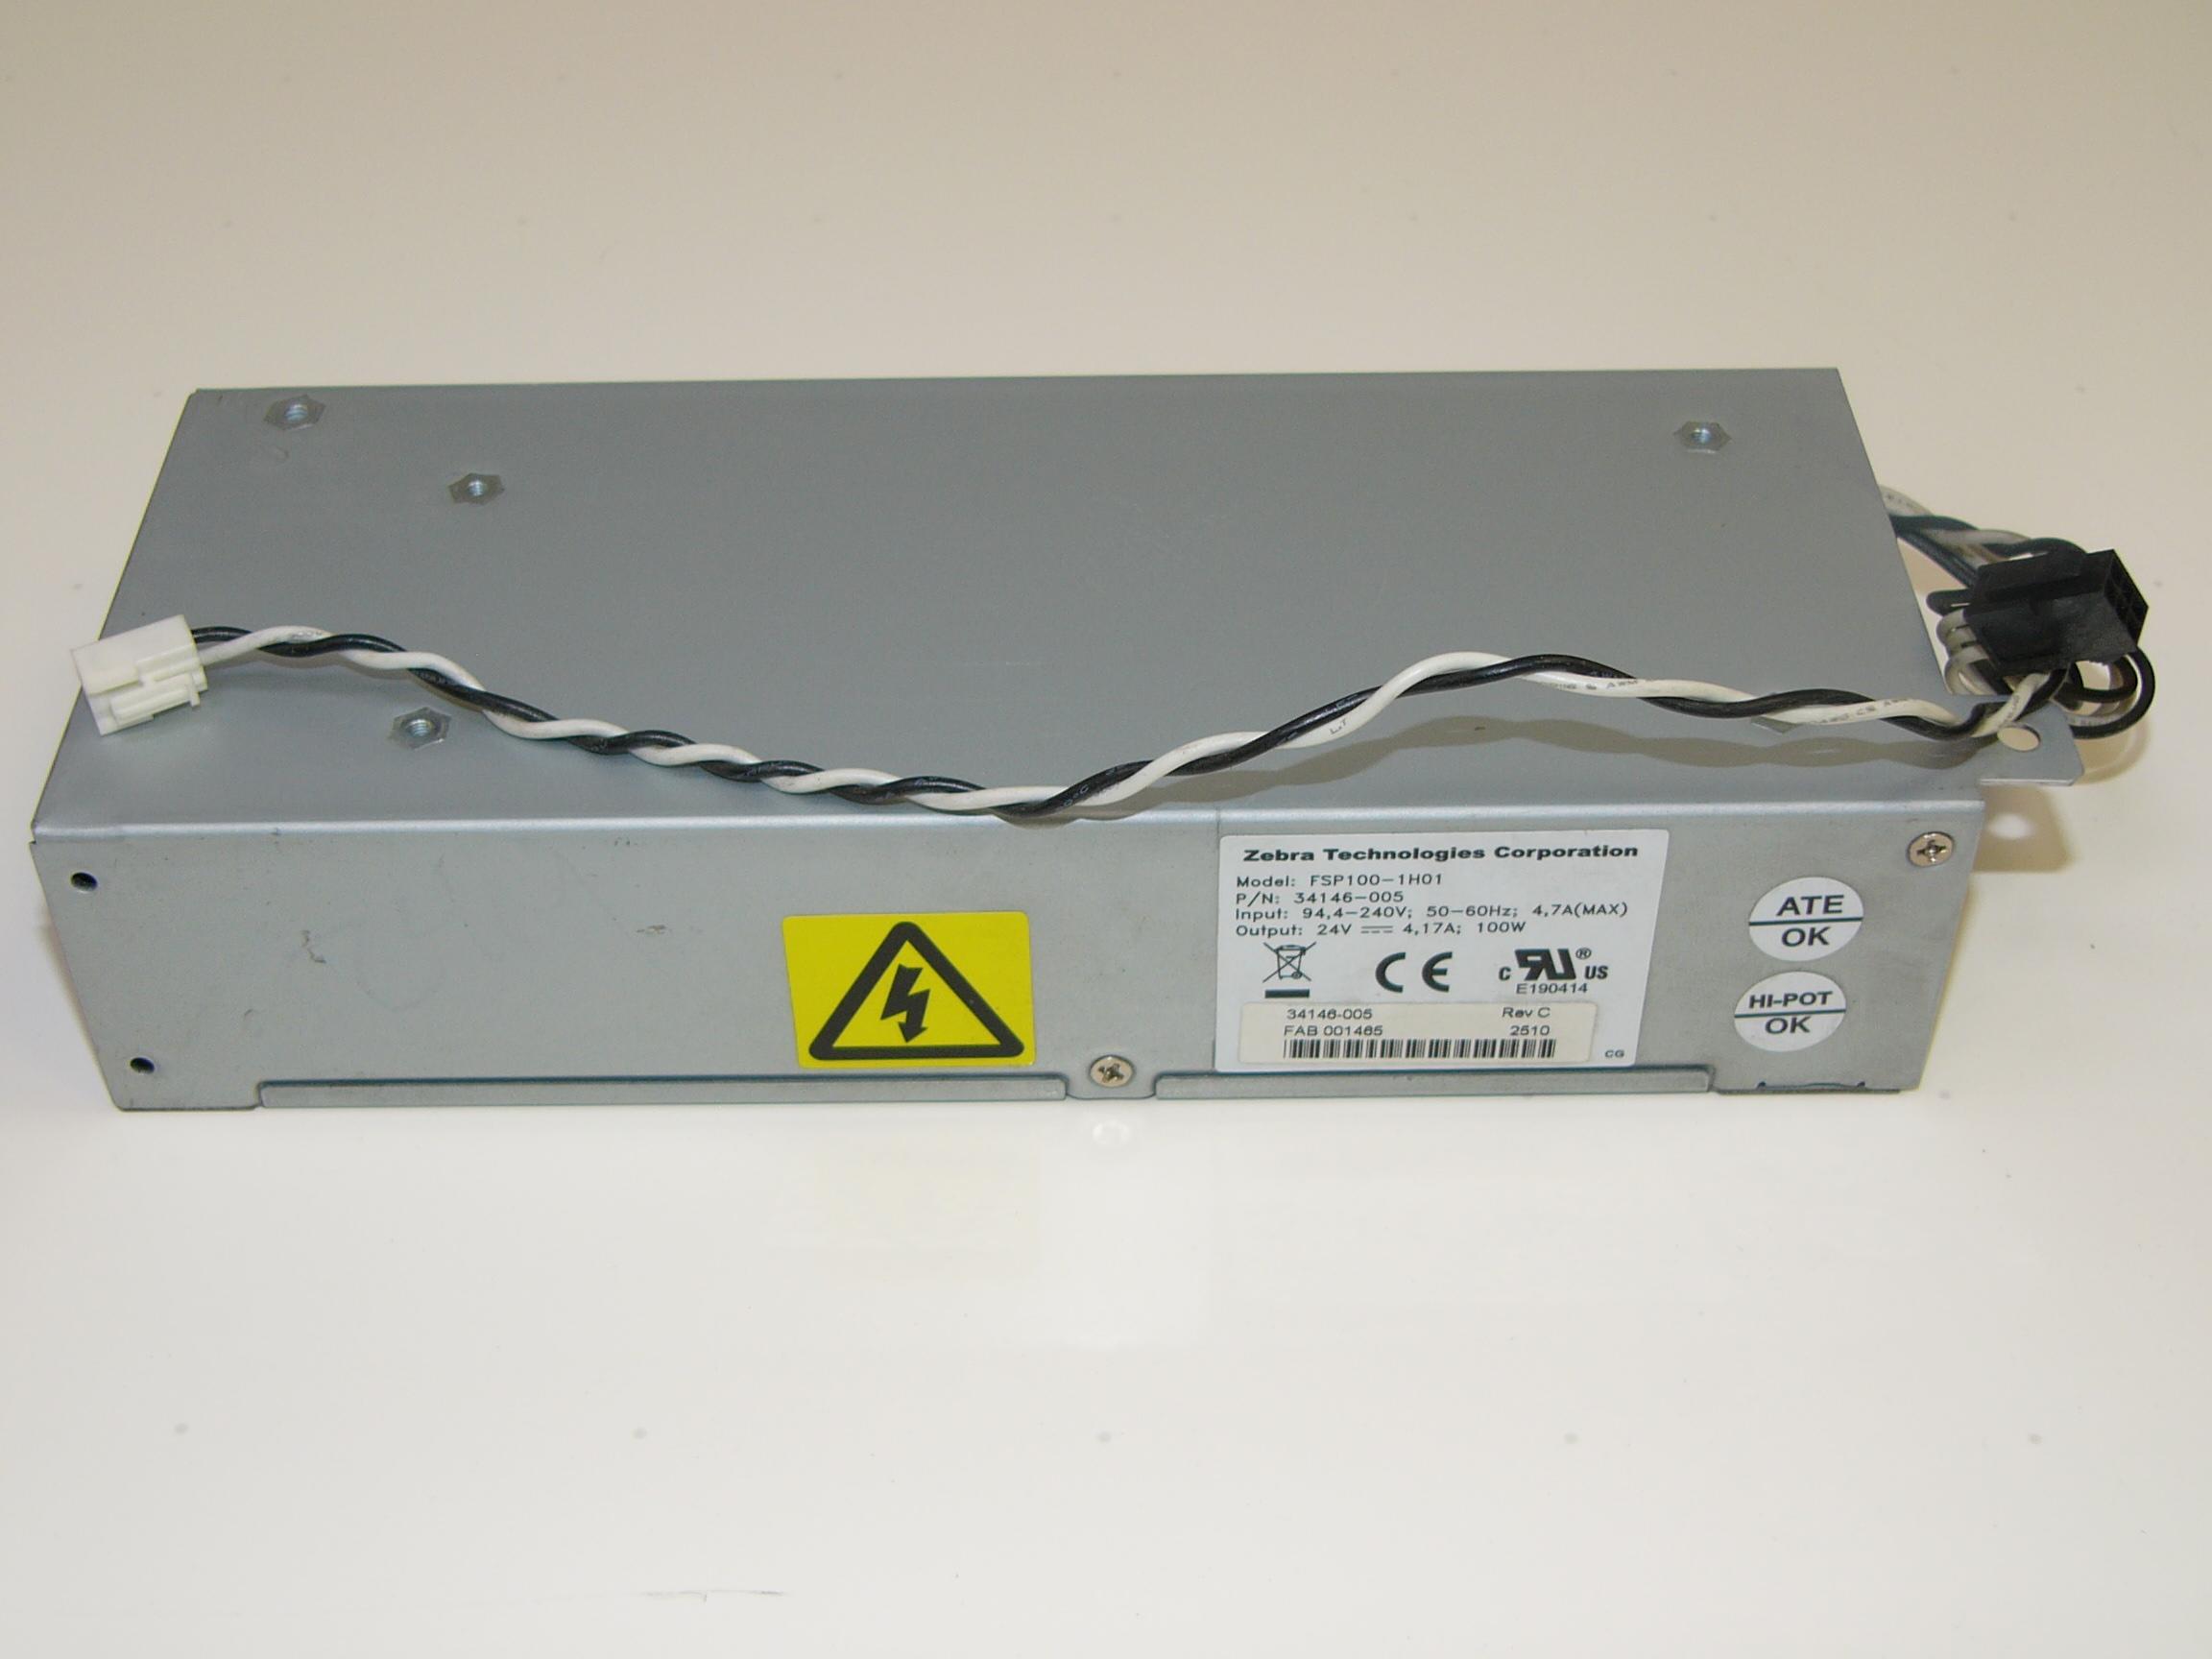 FSP100-1H01 -  - FSP100-1H01, Zebra S4M, Power Supply